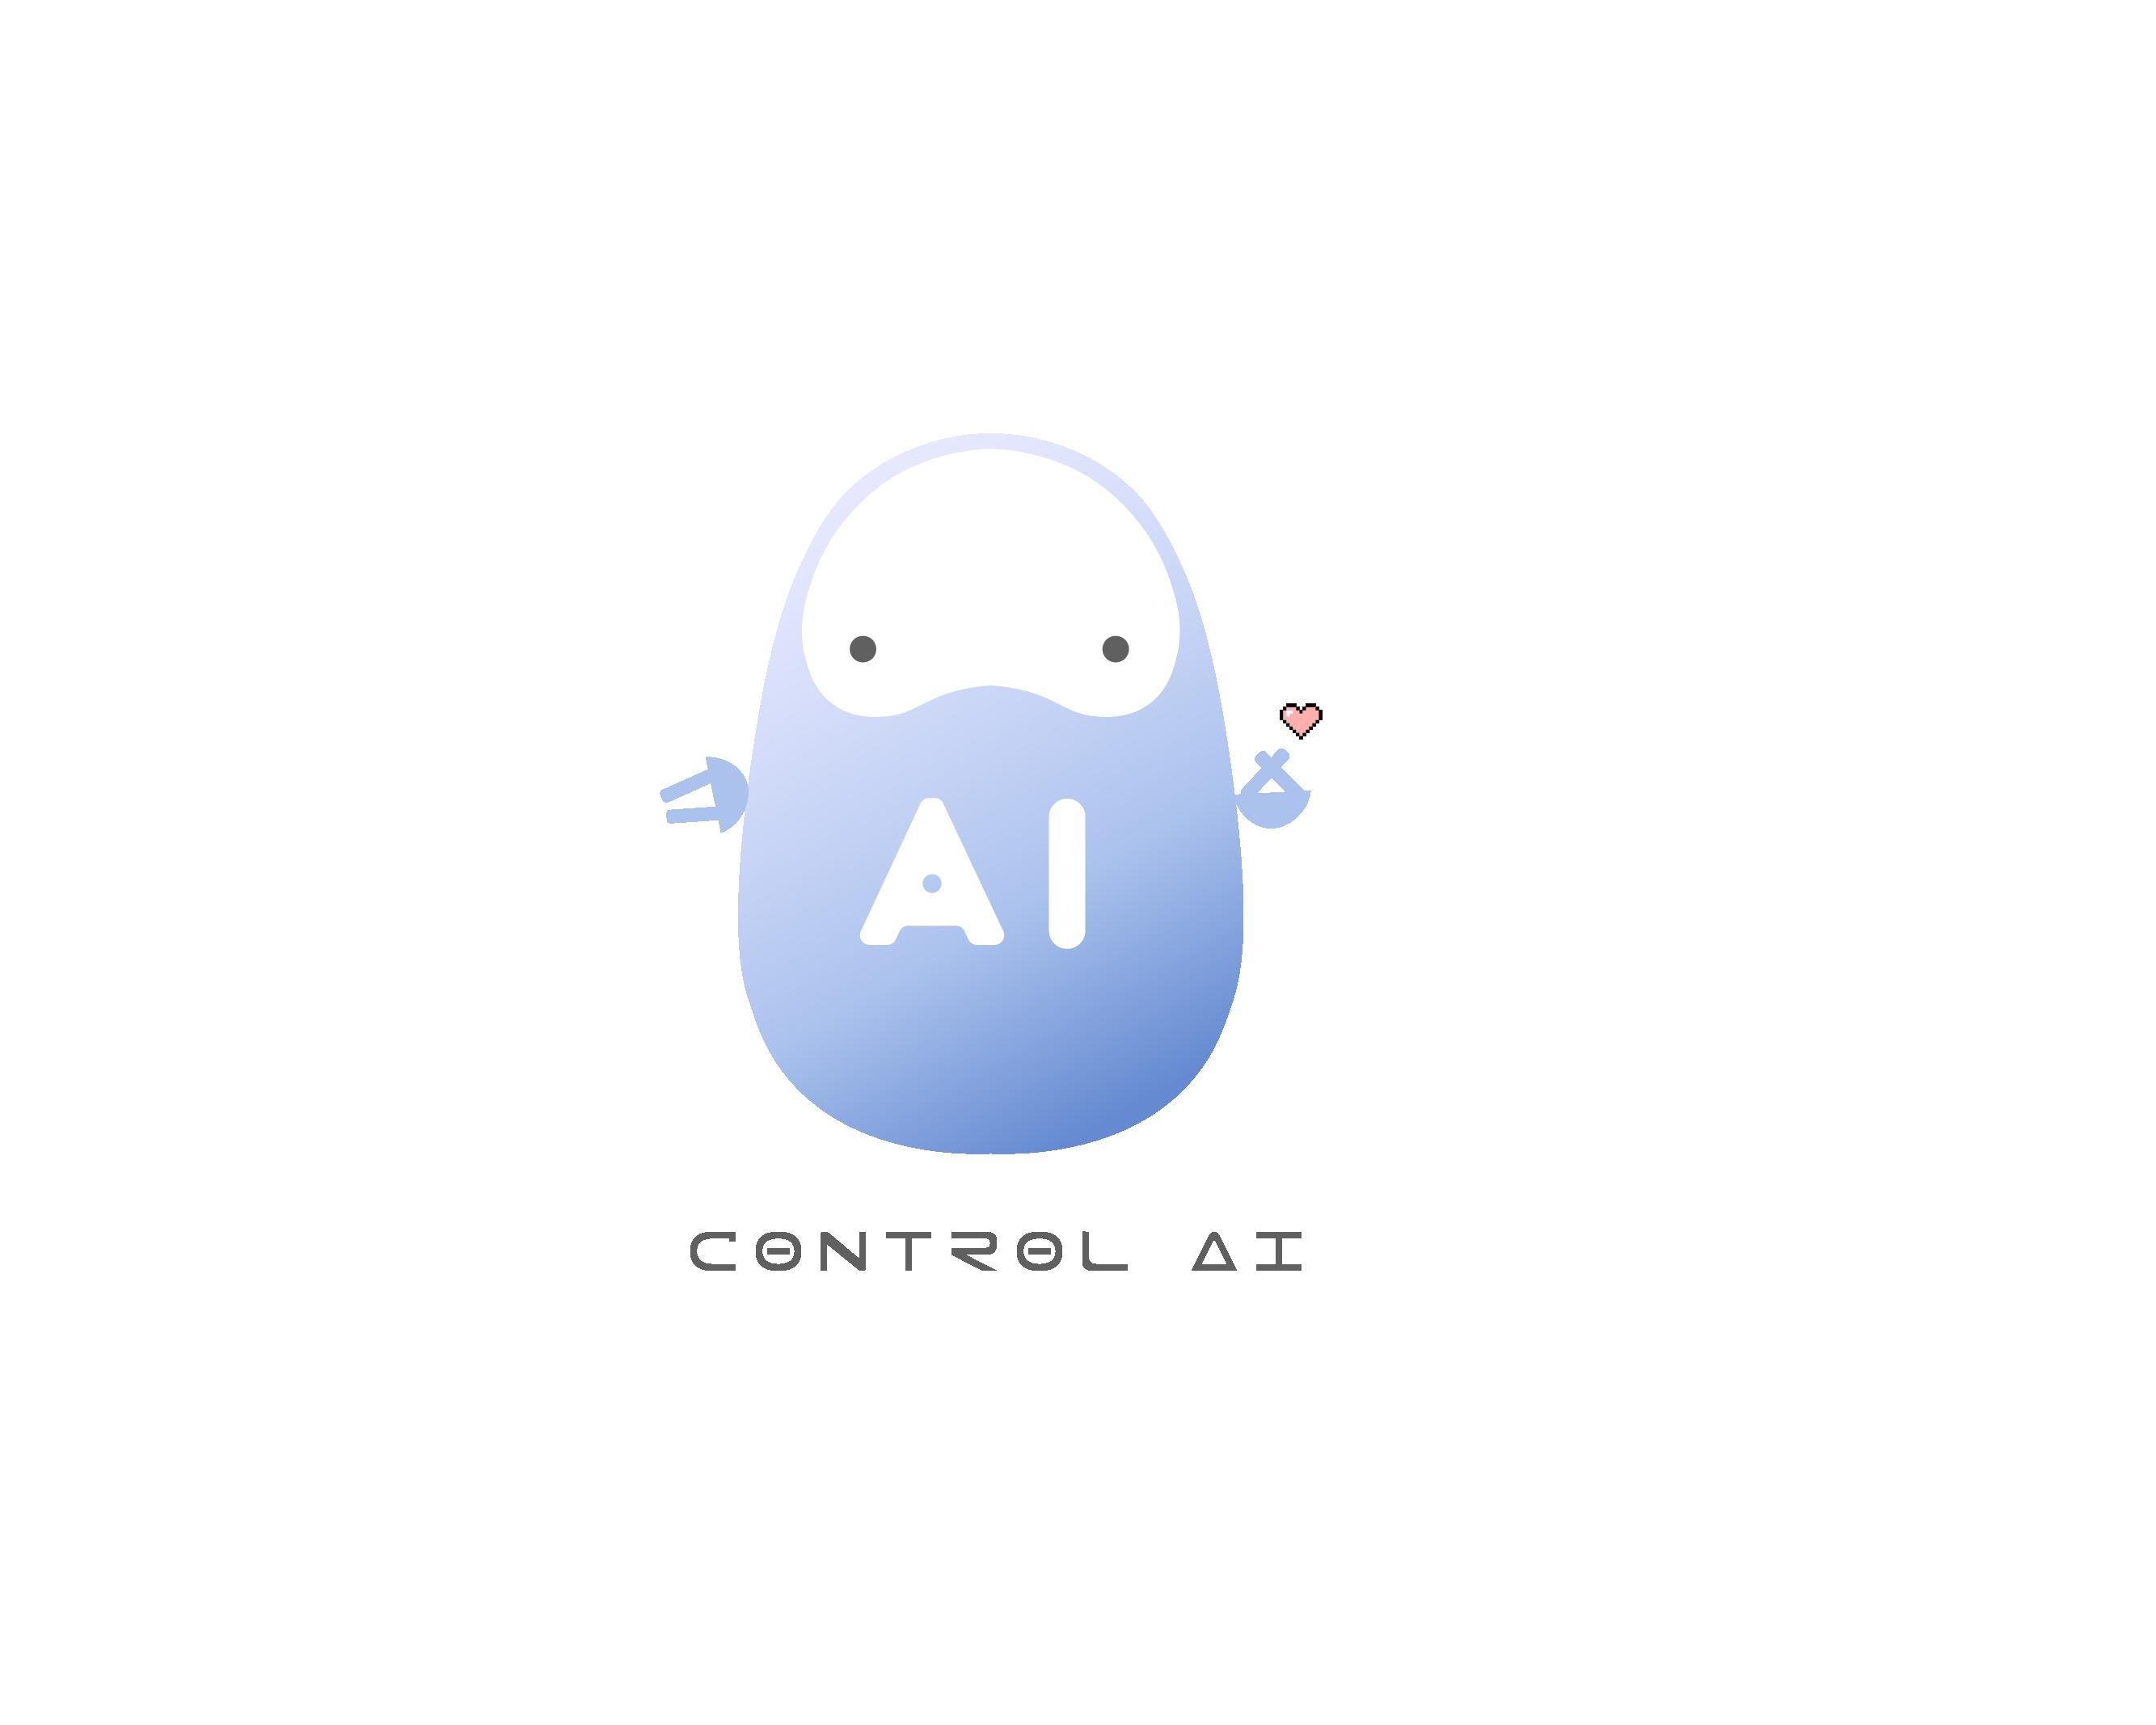 ControlPlusAI